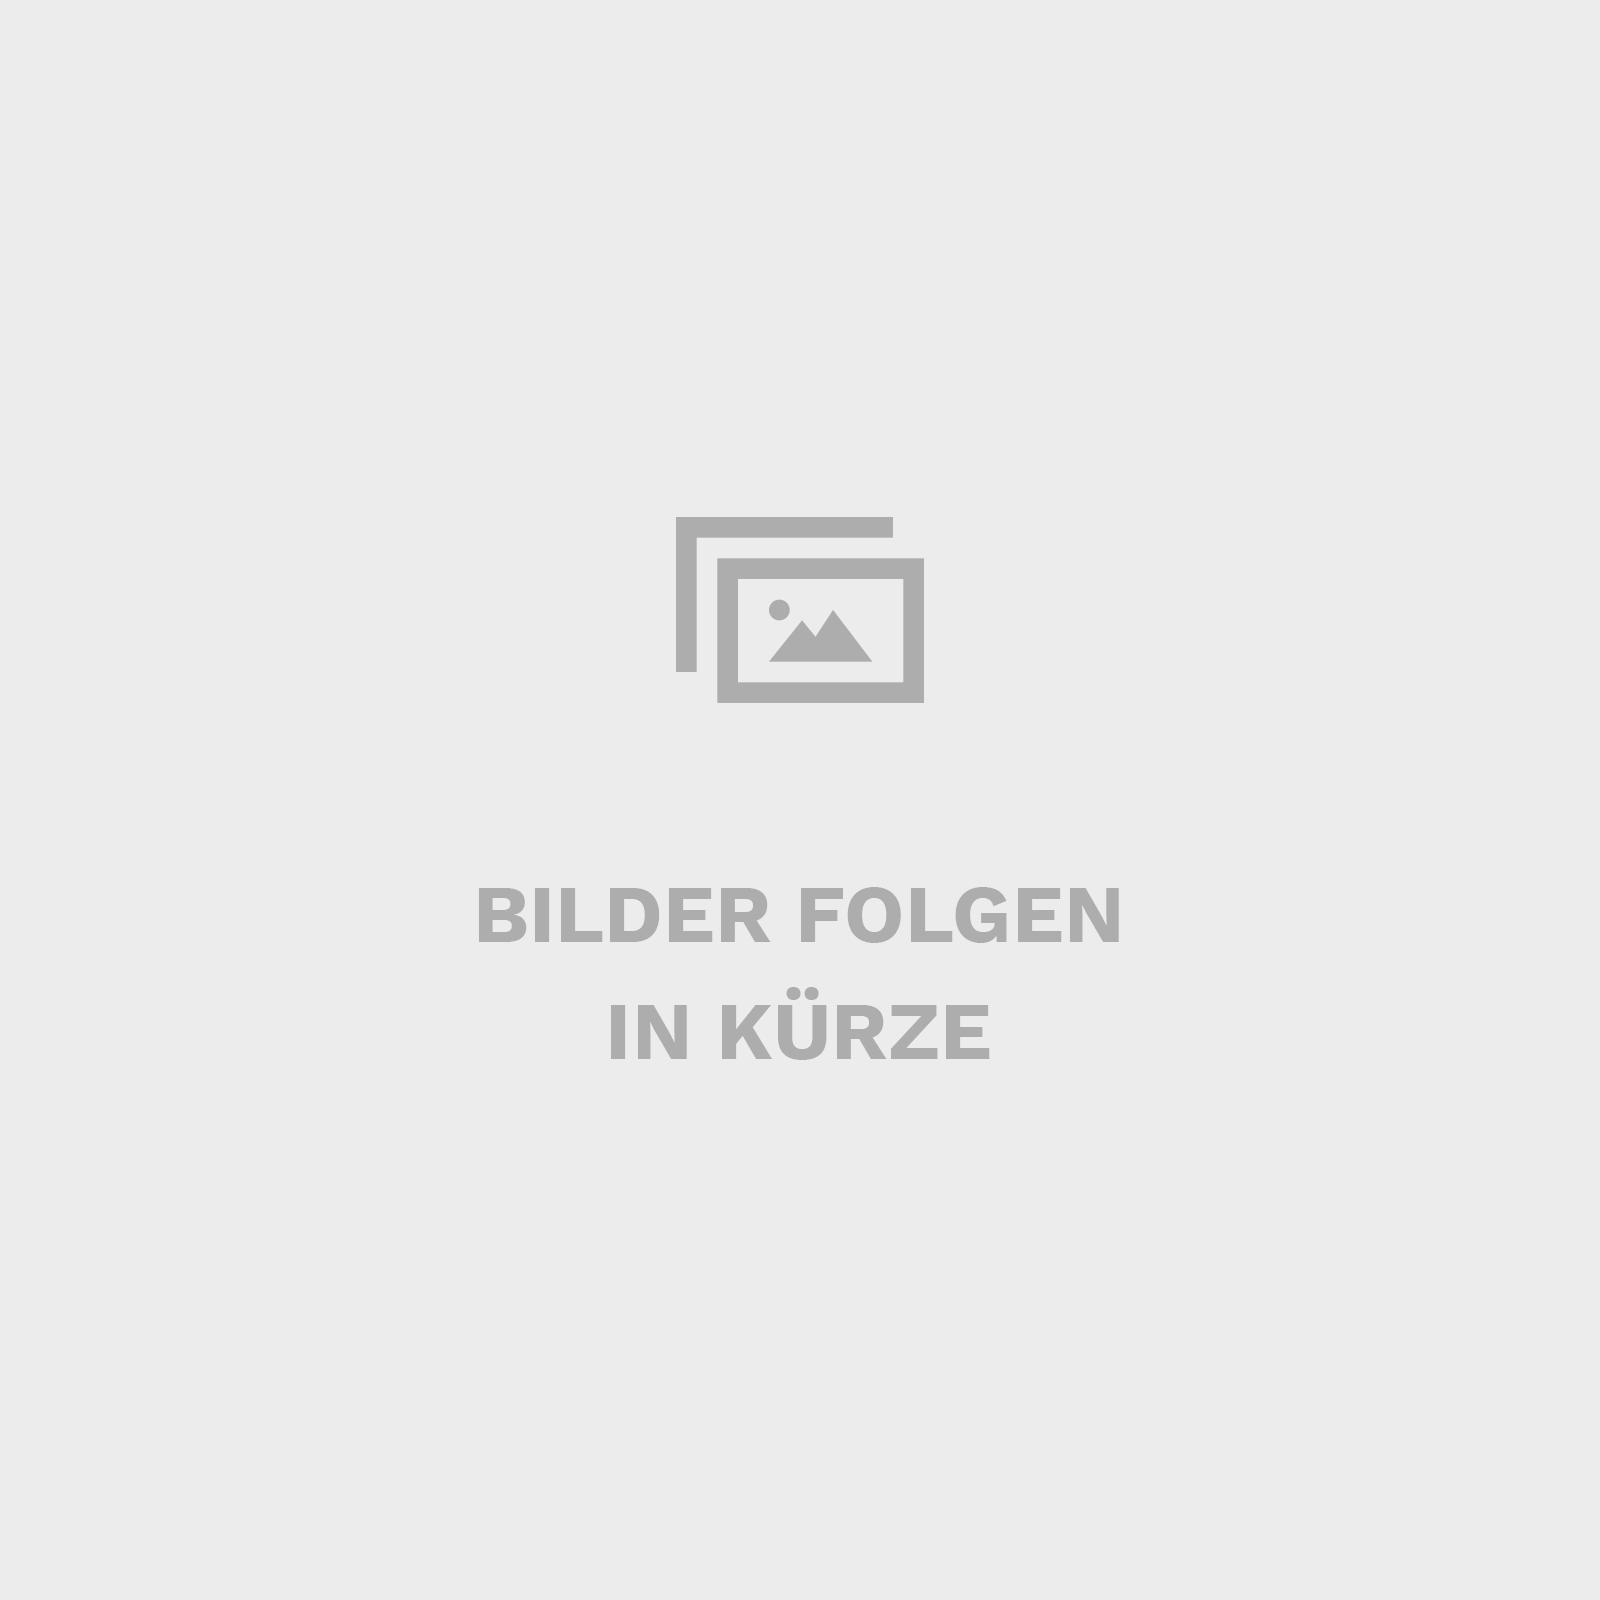 Kvadrat Rugs - Duotone - Farbe 0471 - Detailansicht